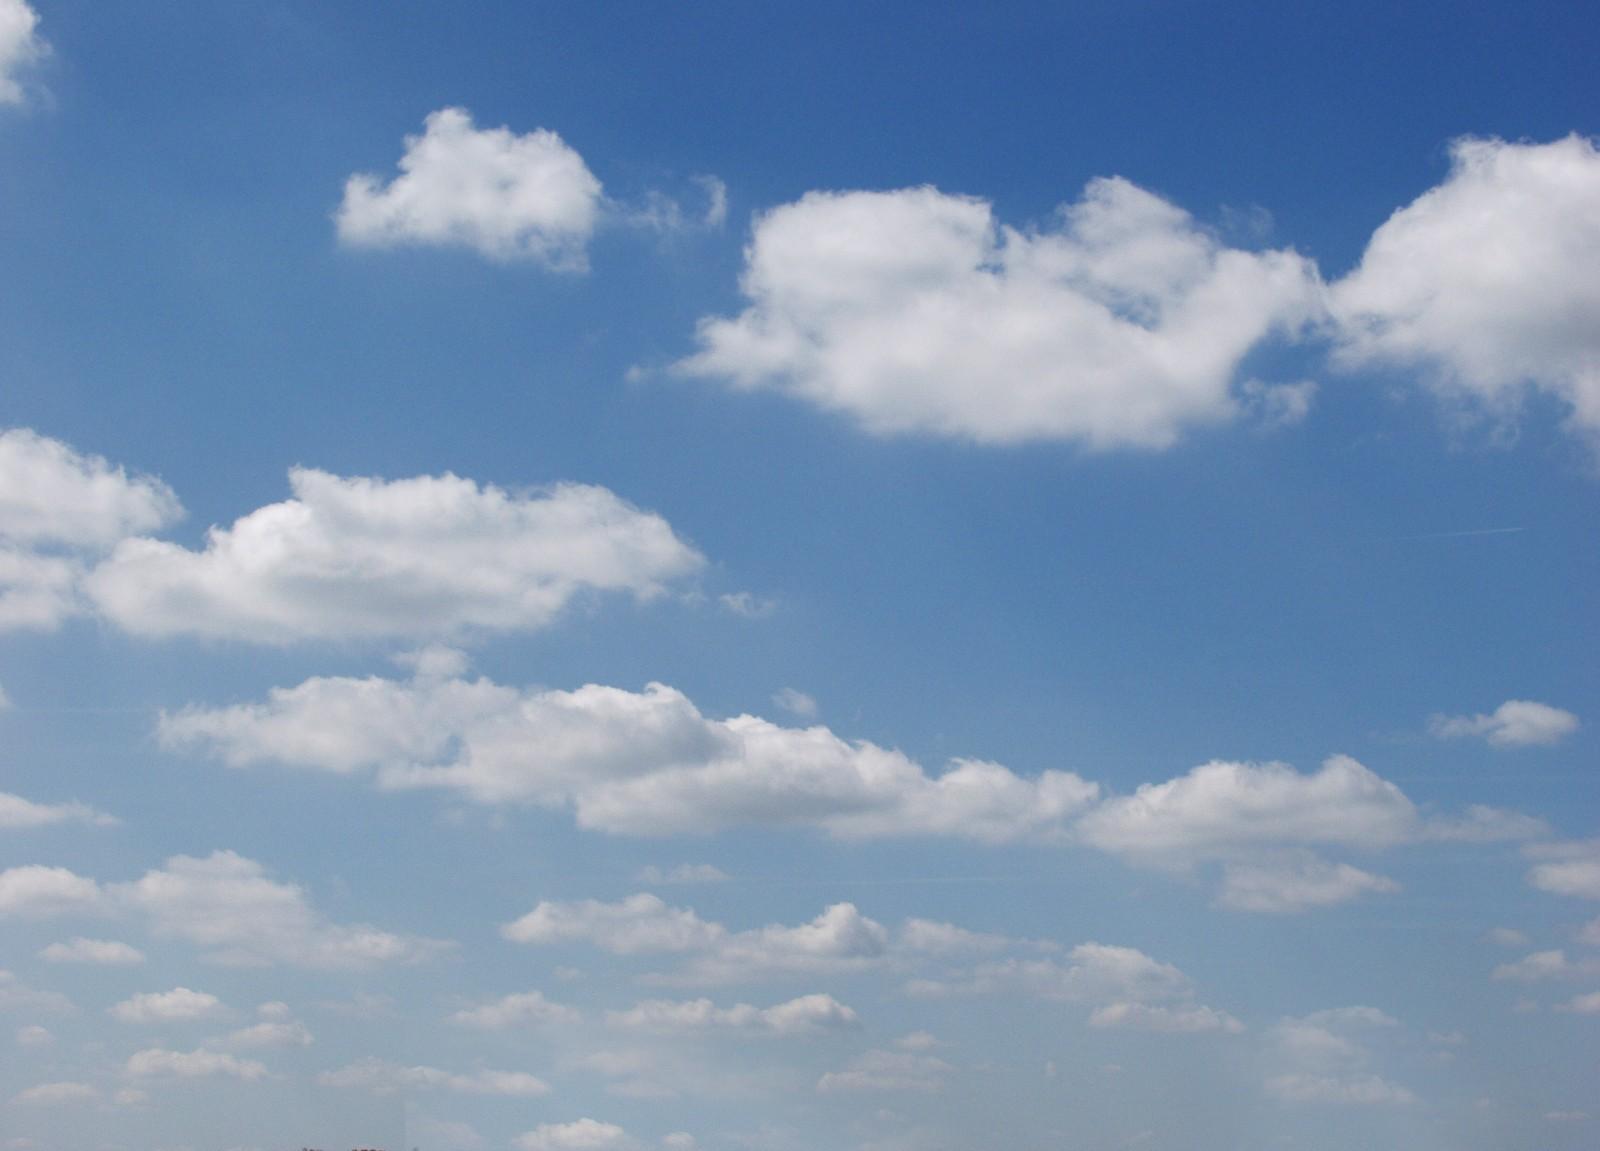 Photoshop Sky Related Keywords & Suggestions - Photoshop Sky Long Tail Keywords